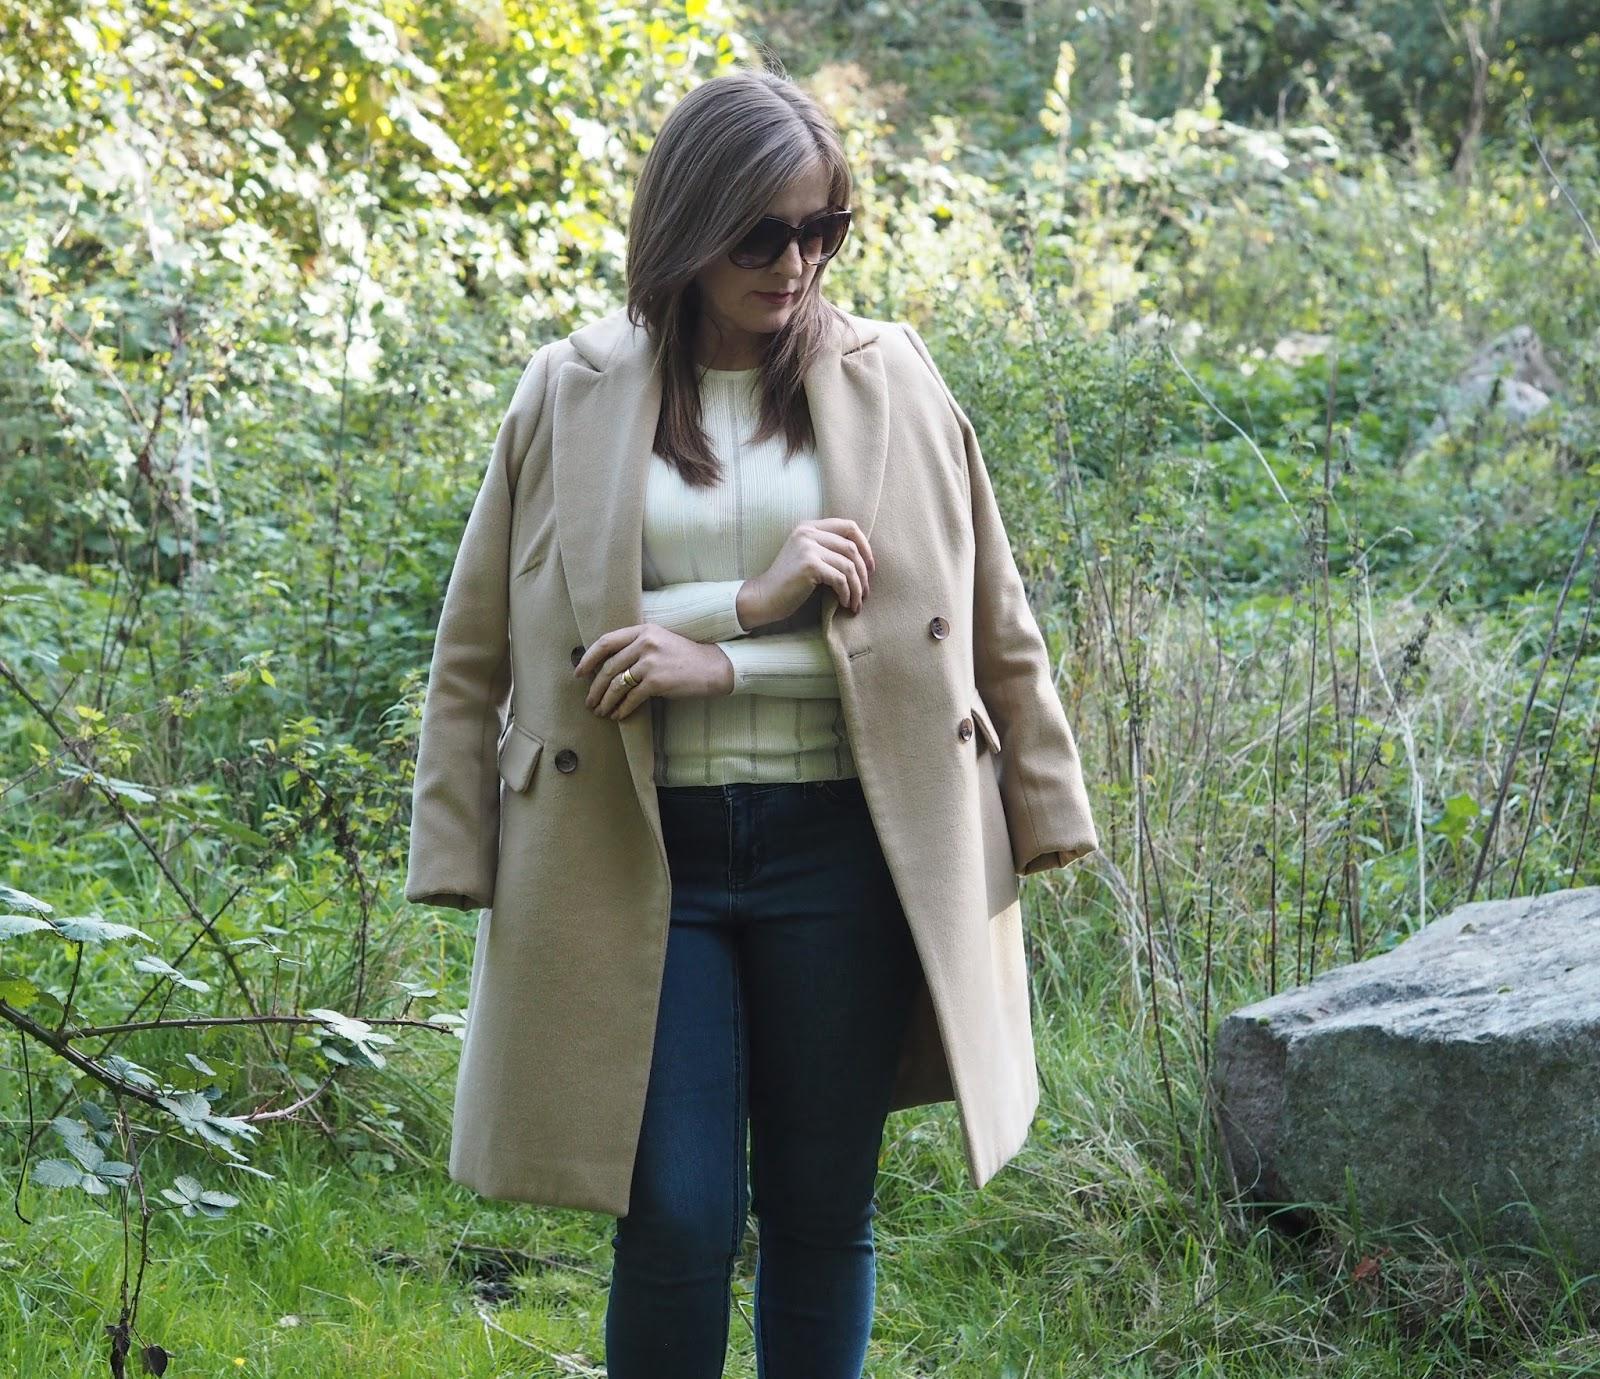 Autumn fashion Burberry scarf Priceless Life of Mine